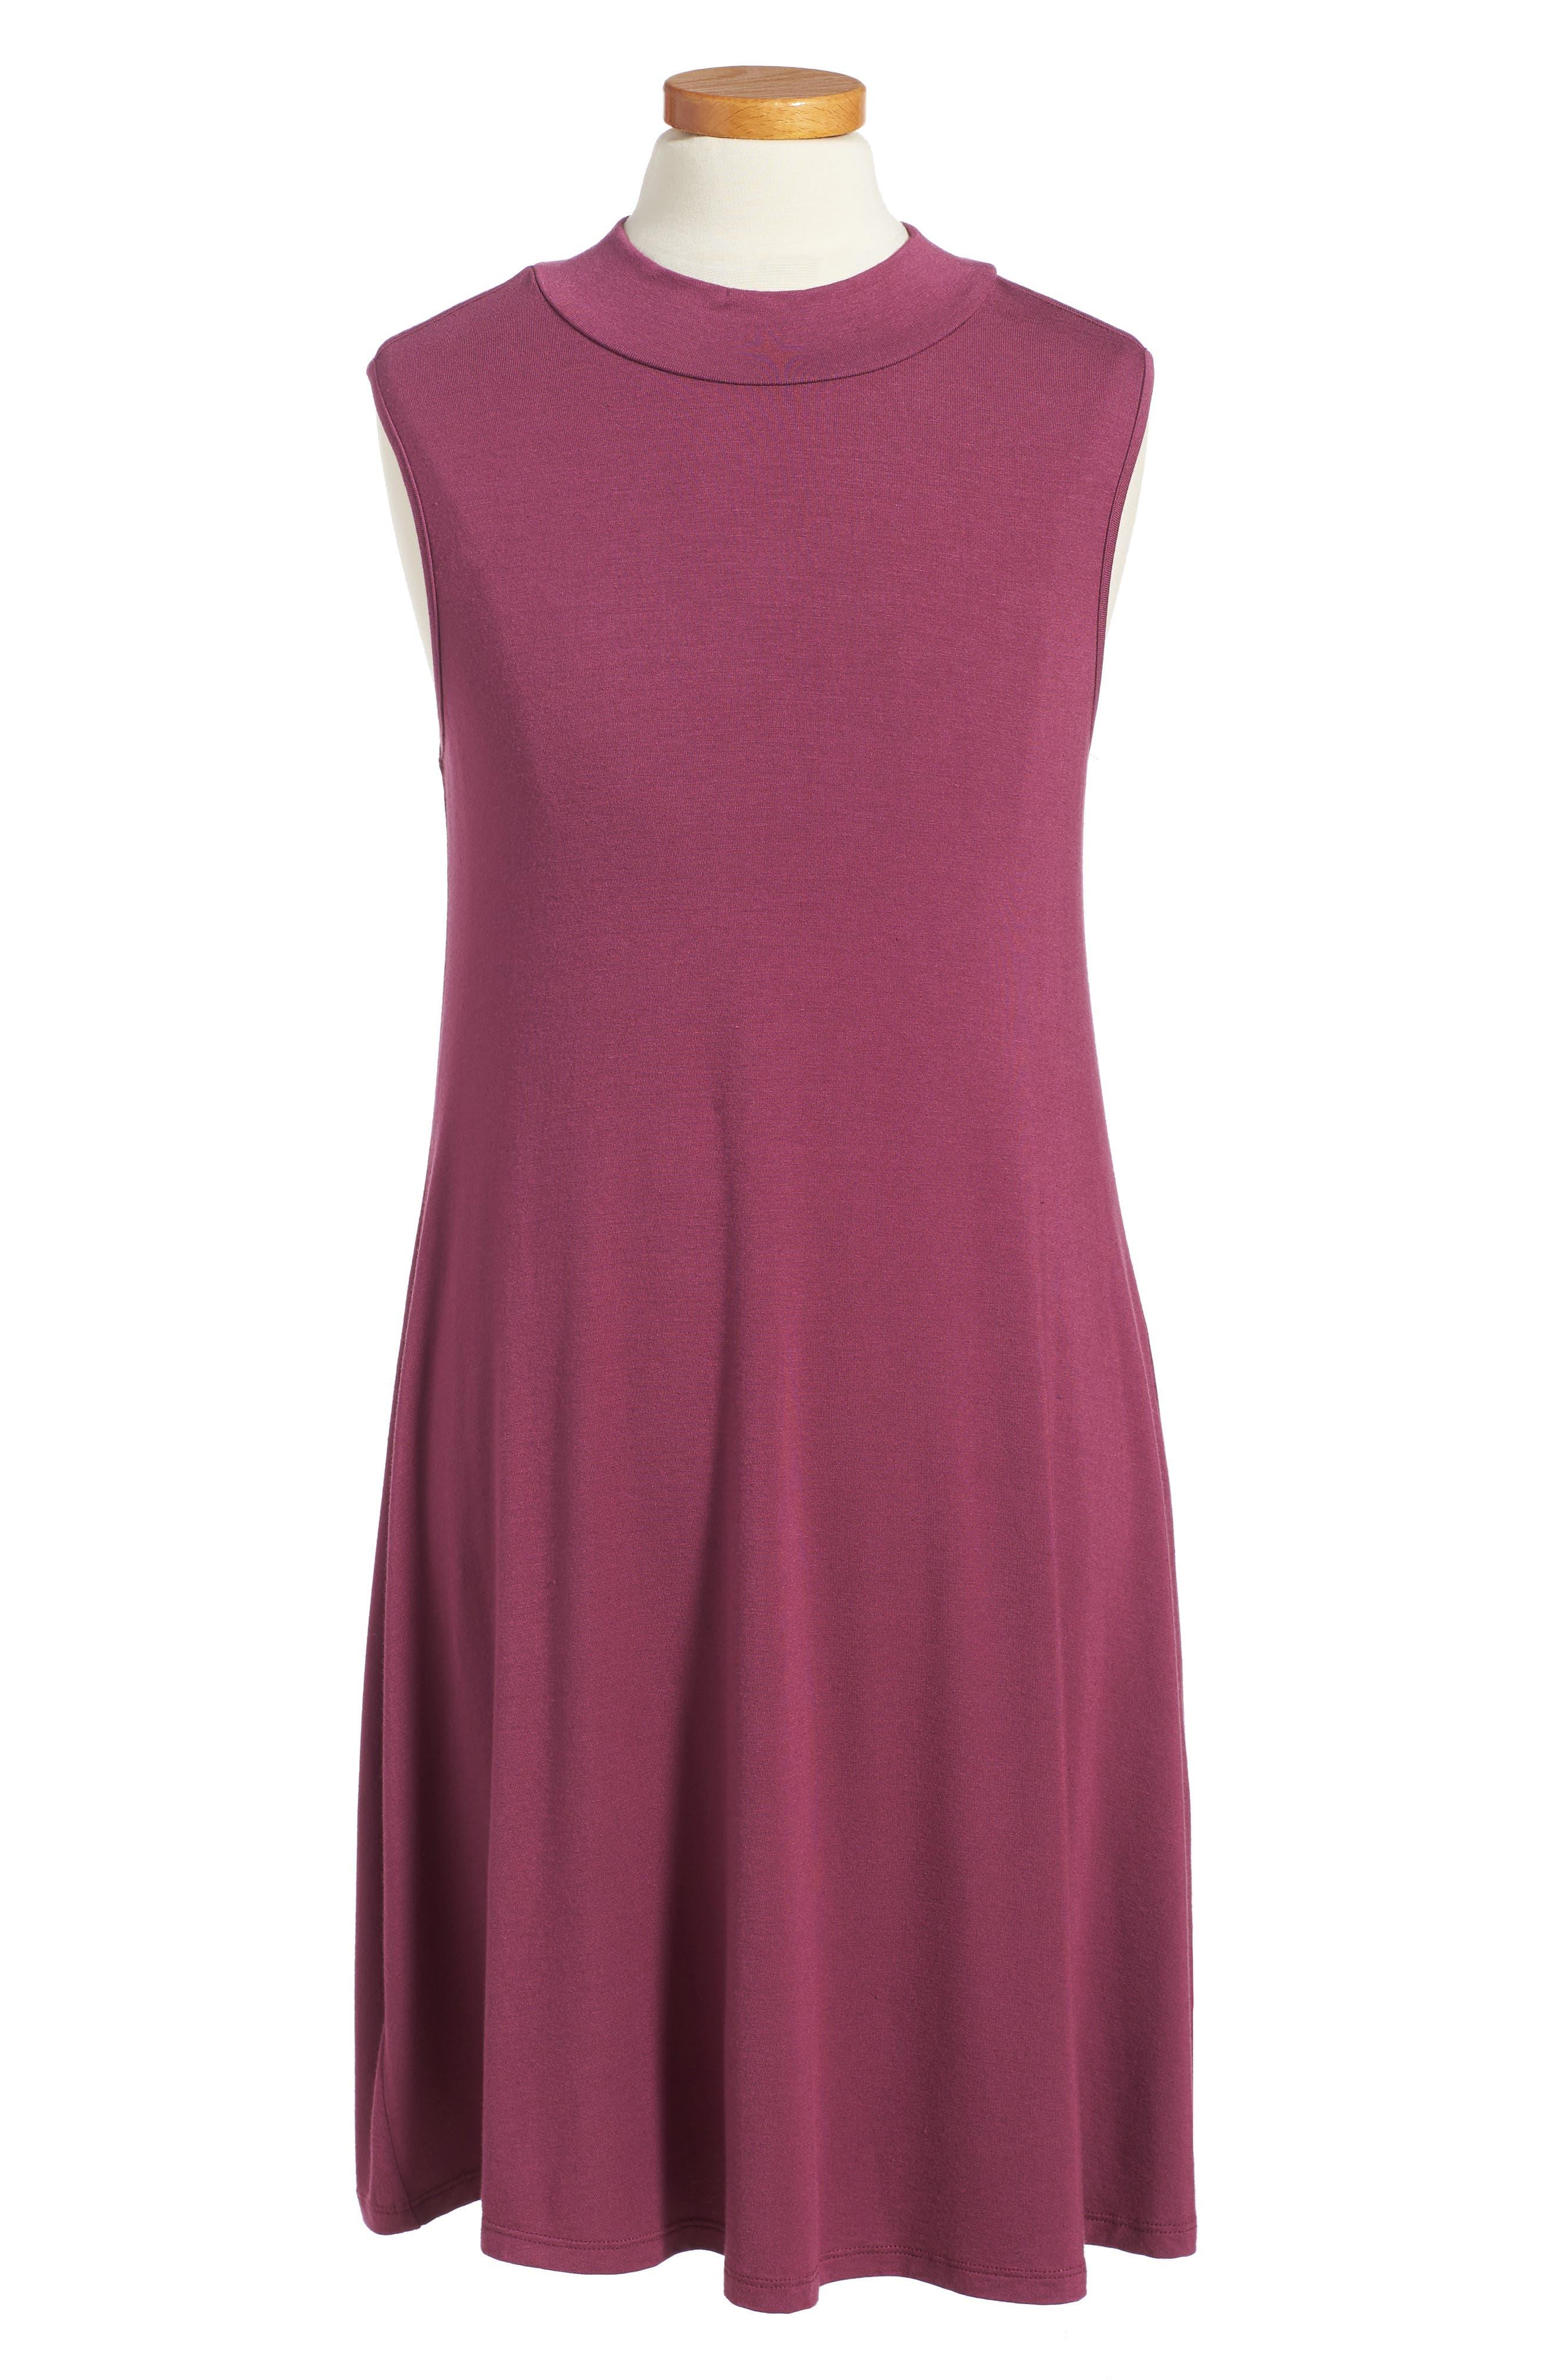 Penelope Tree Phyllis Stripe Mock Neck Dress (Big Girls)